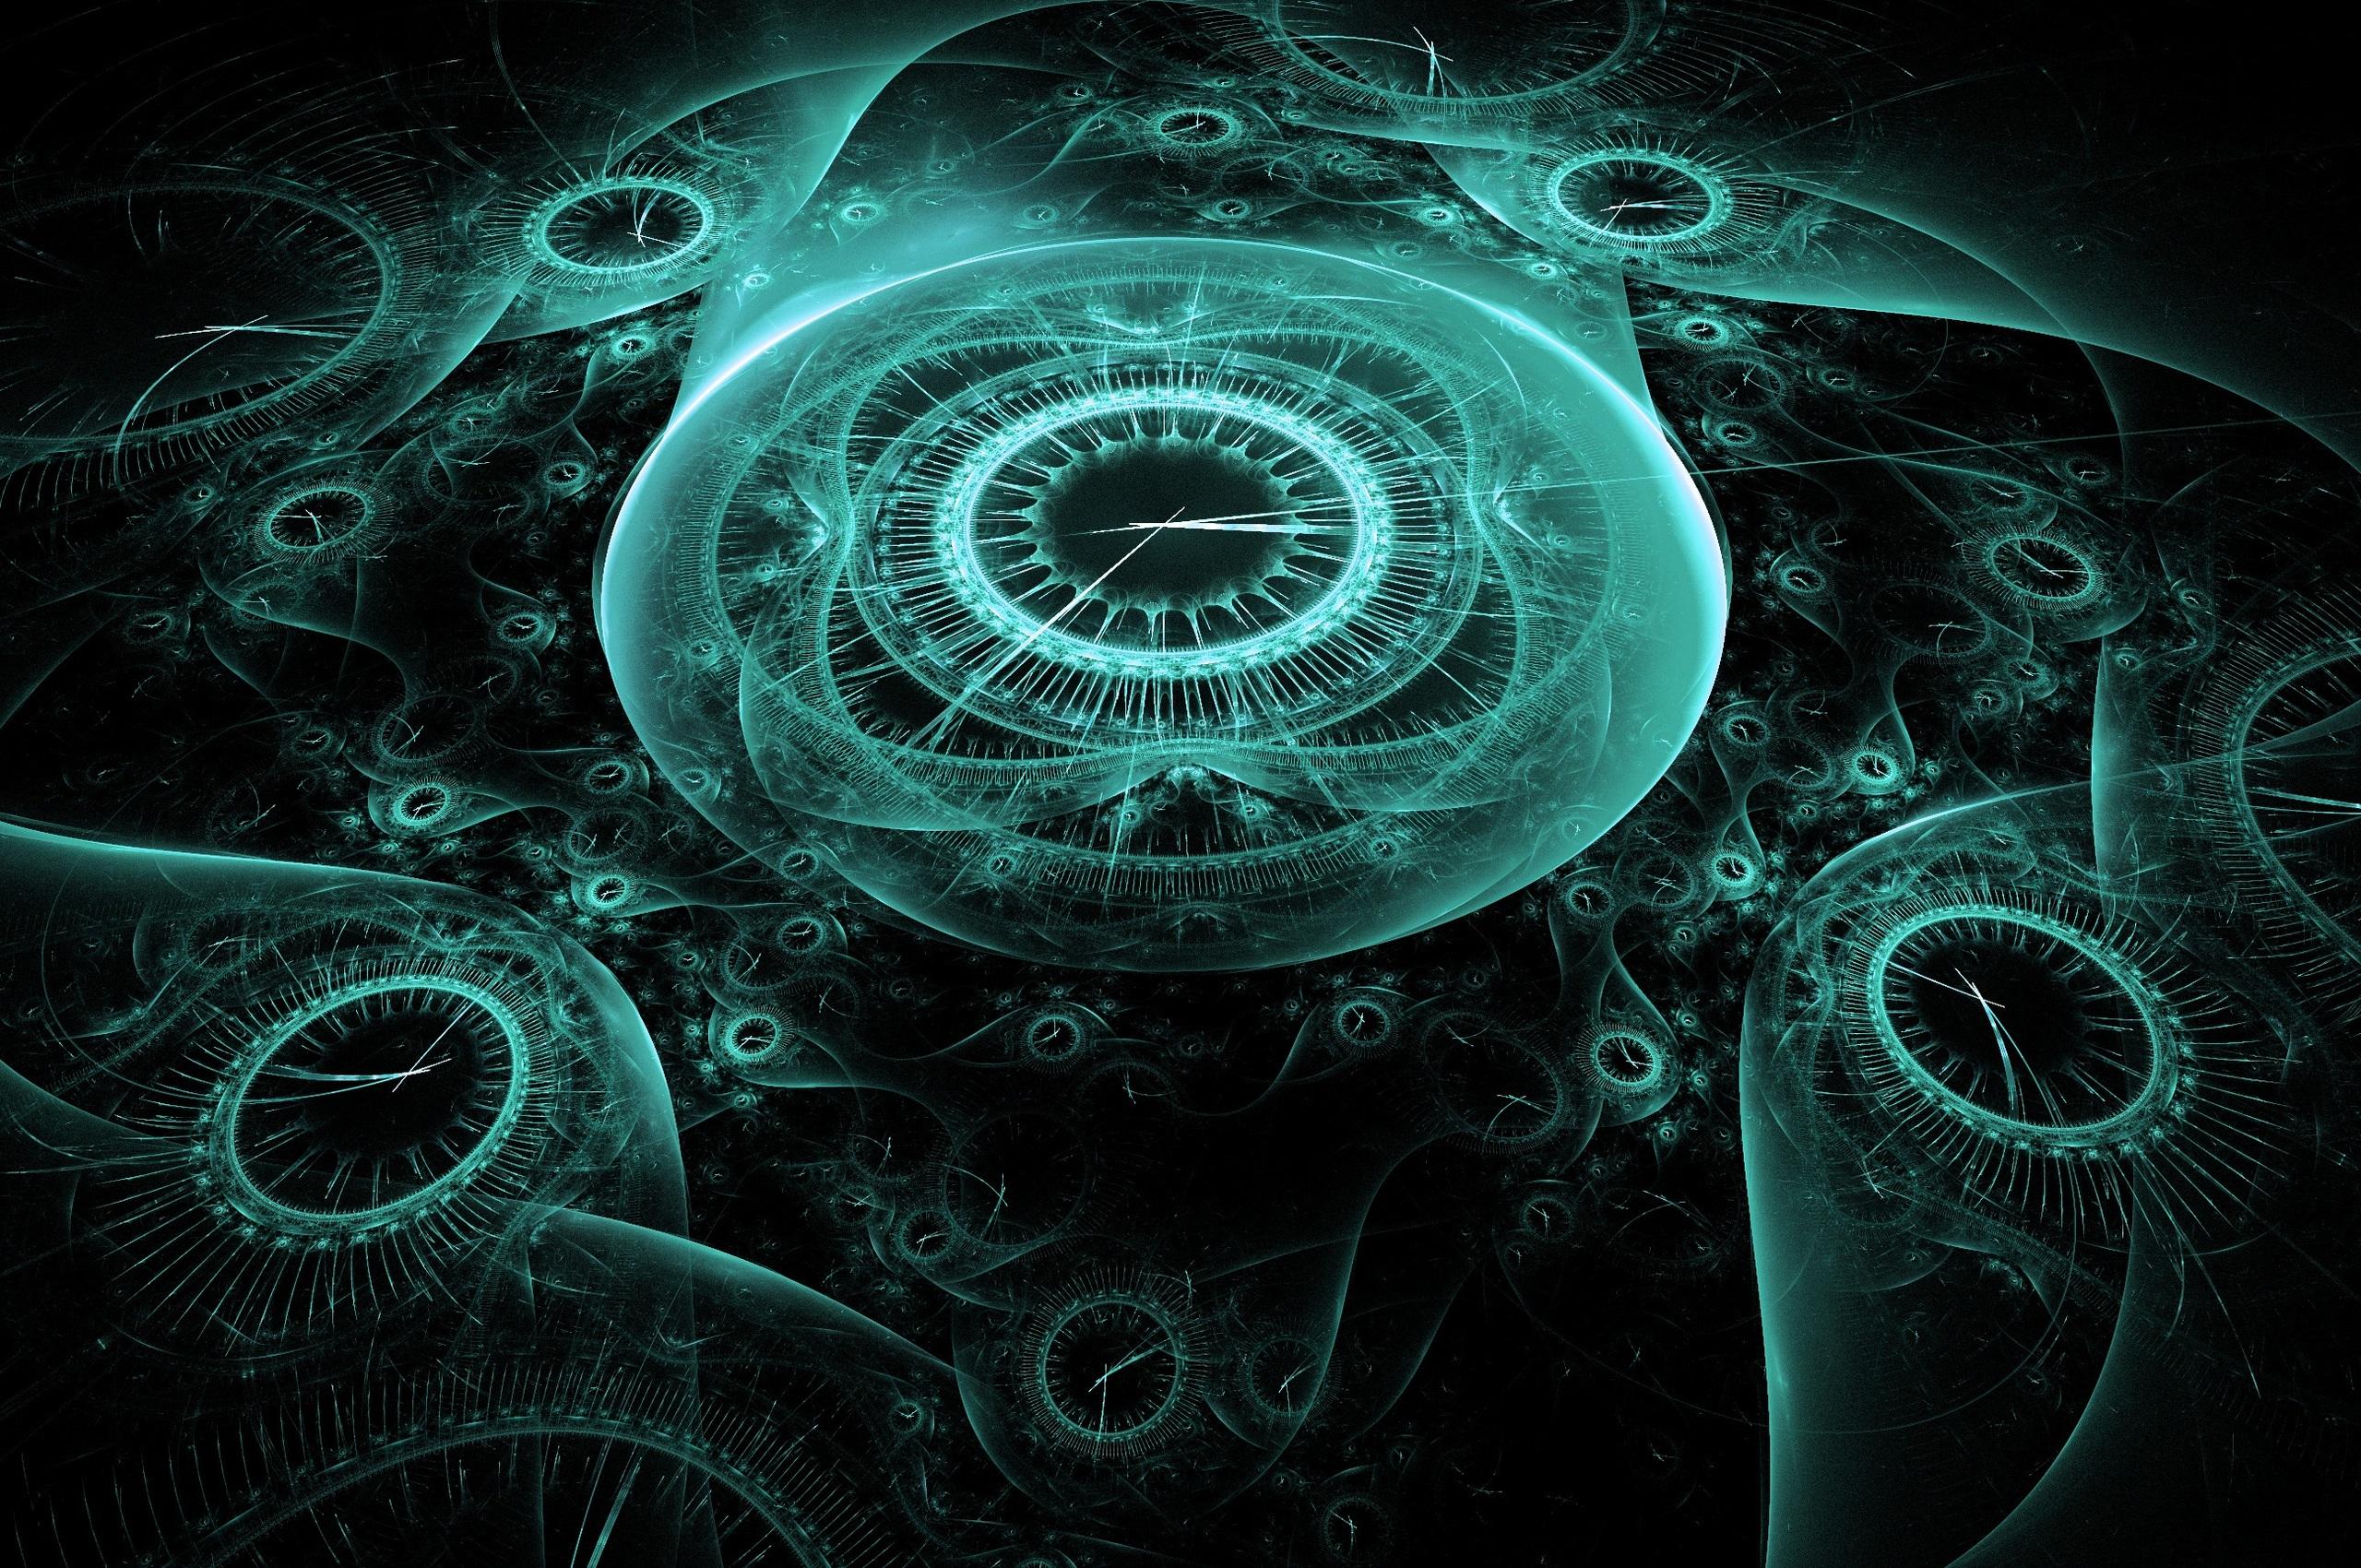 2560x1700 Time Clock Digital Creative Illustration